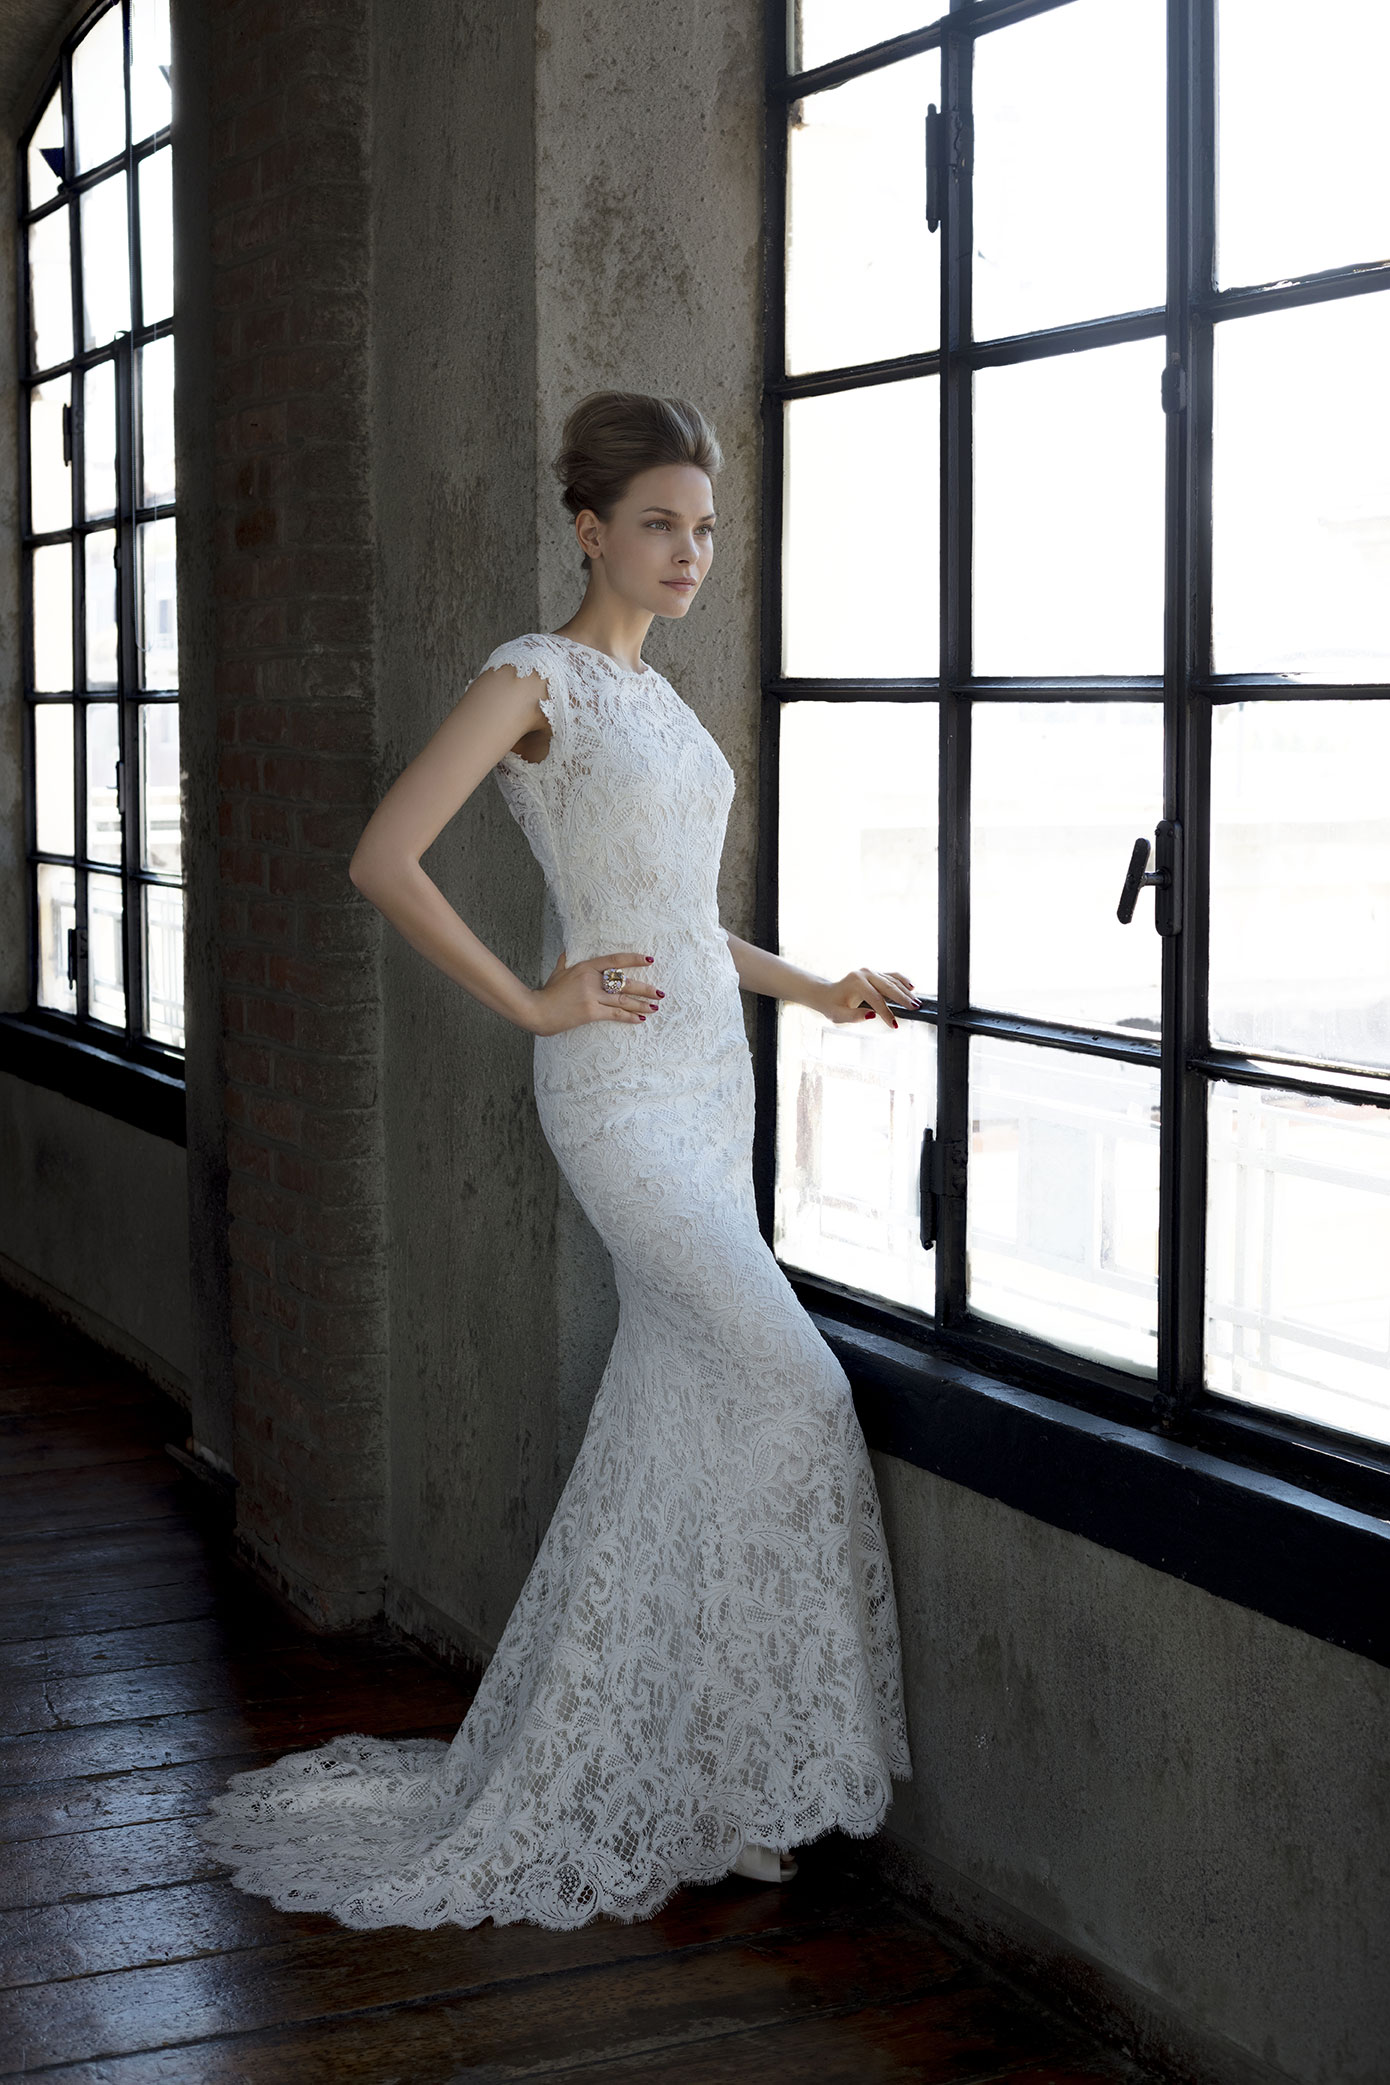 abiti da sposa mod mod - bierucknilat.tk 68300002ca9